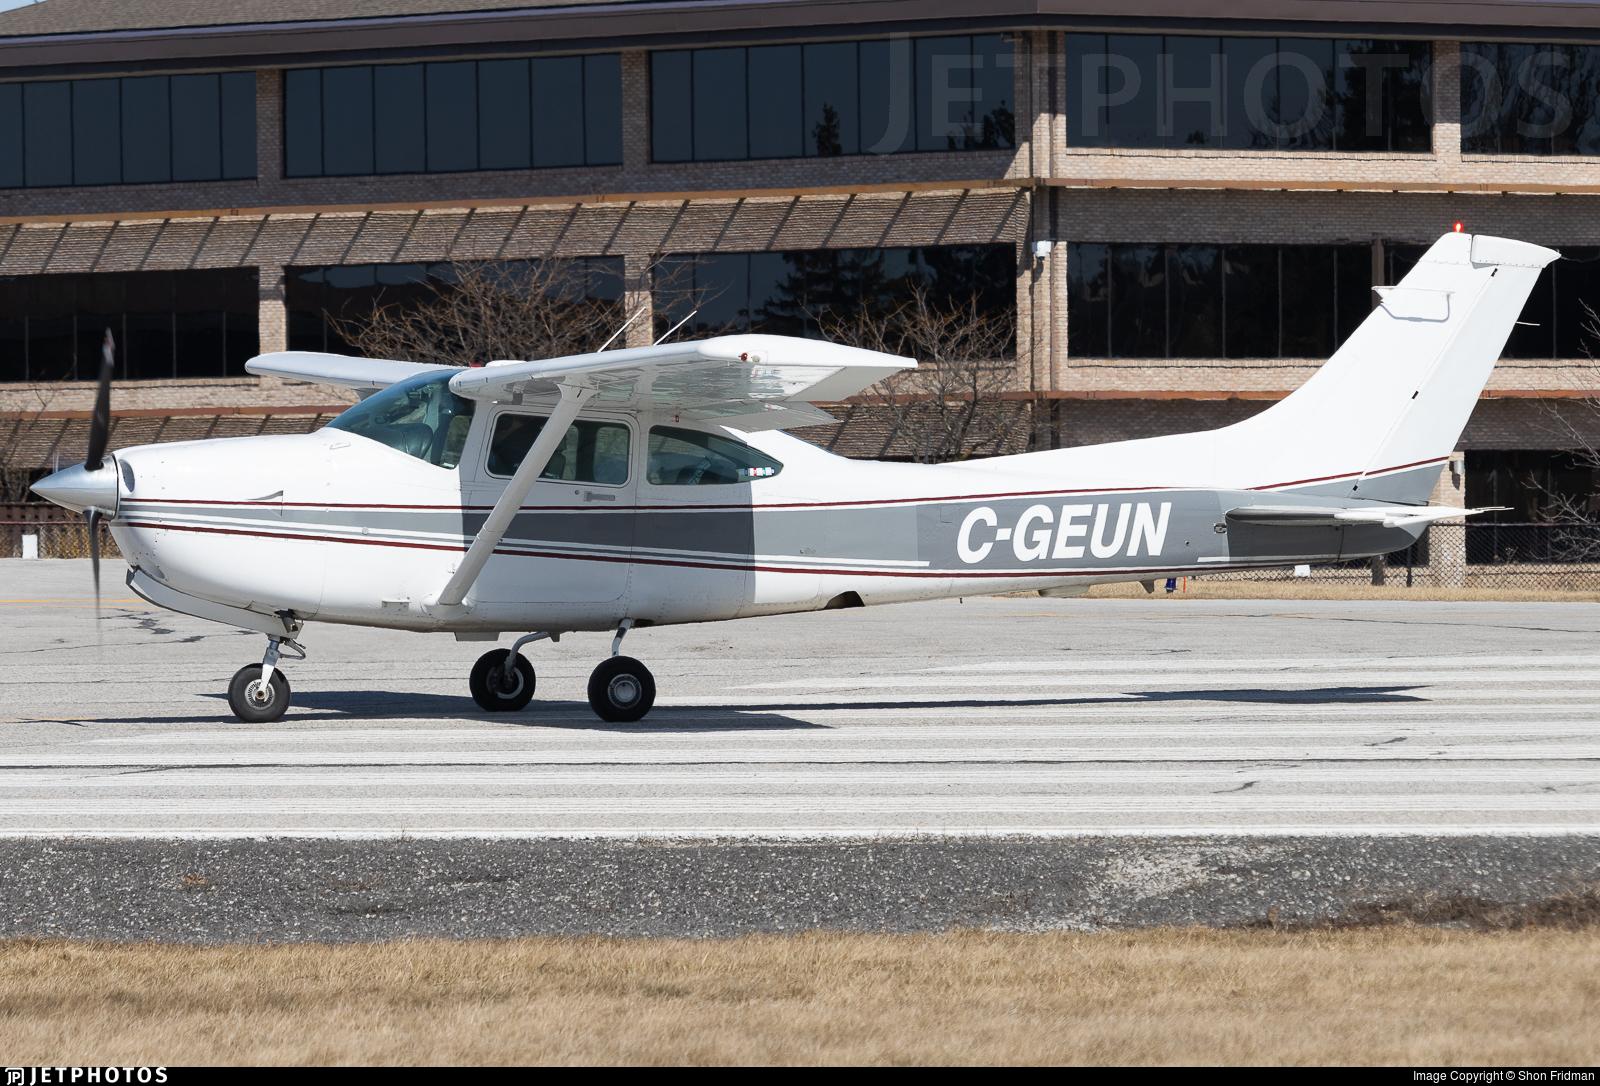 C-GEUN - Cessna R182 Skylane RG - Private